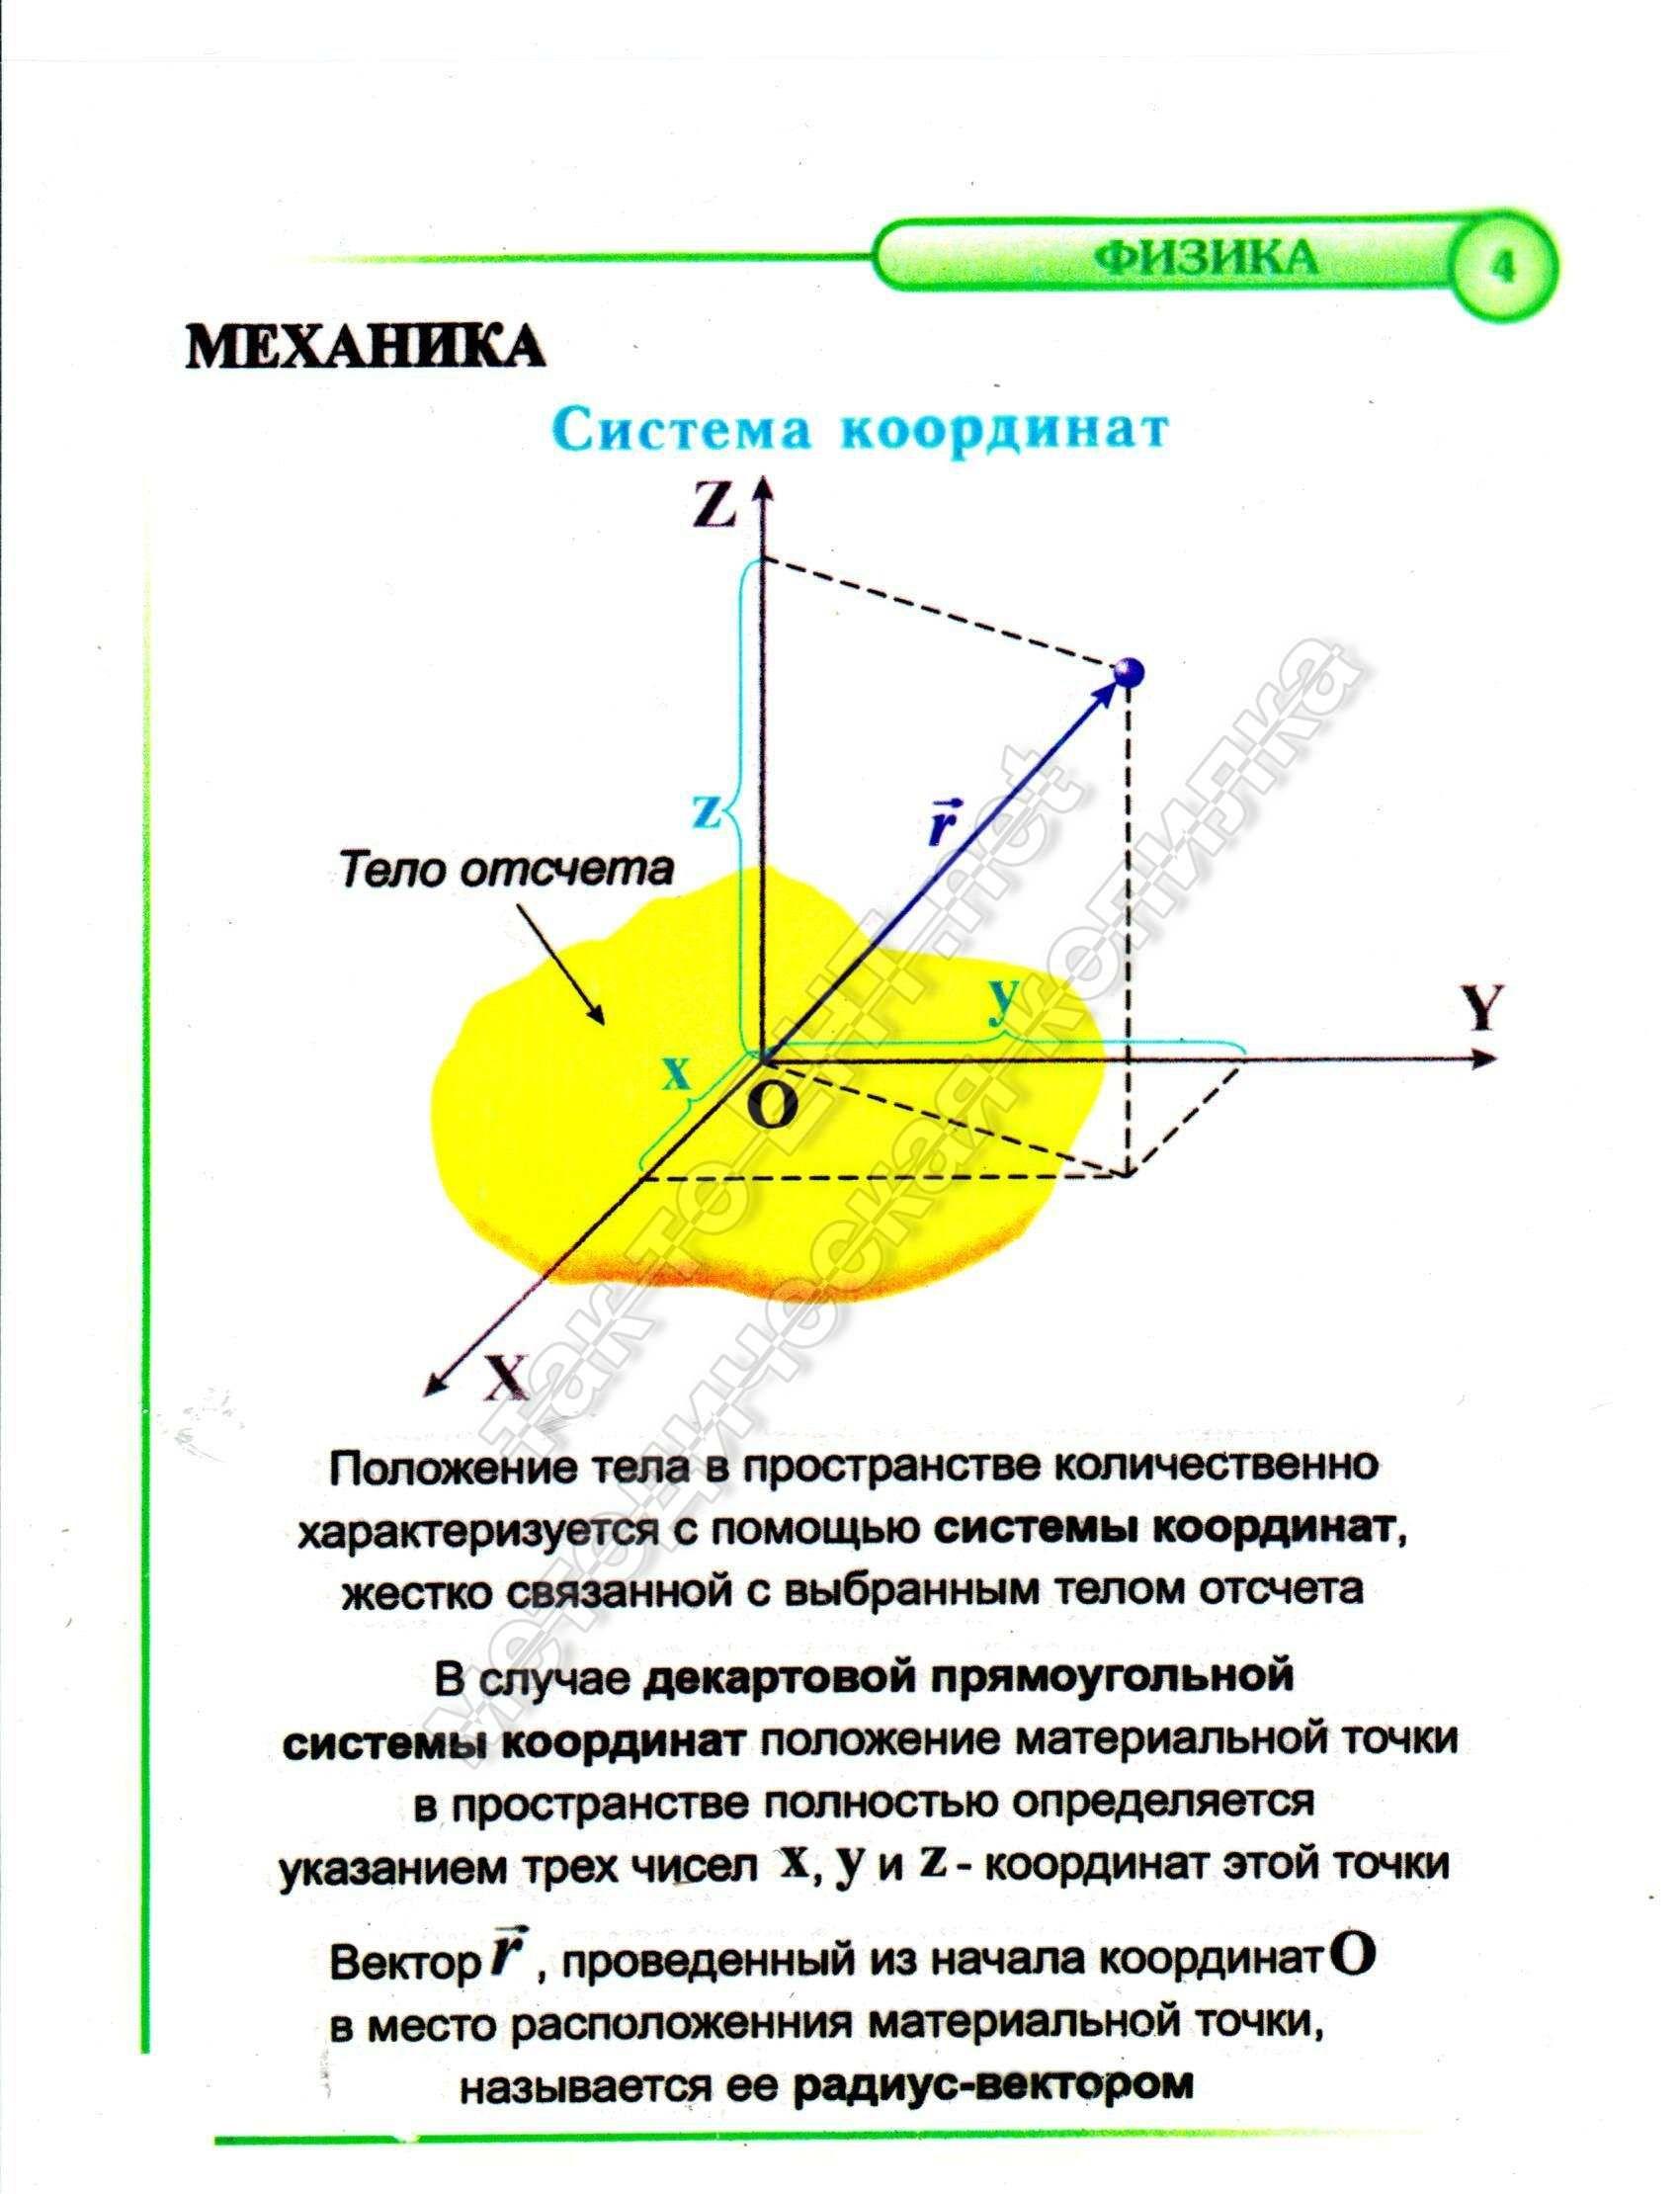 4 Система координат (механика)